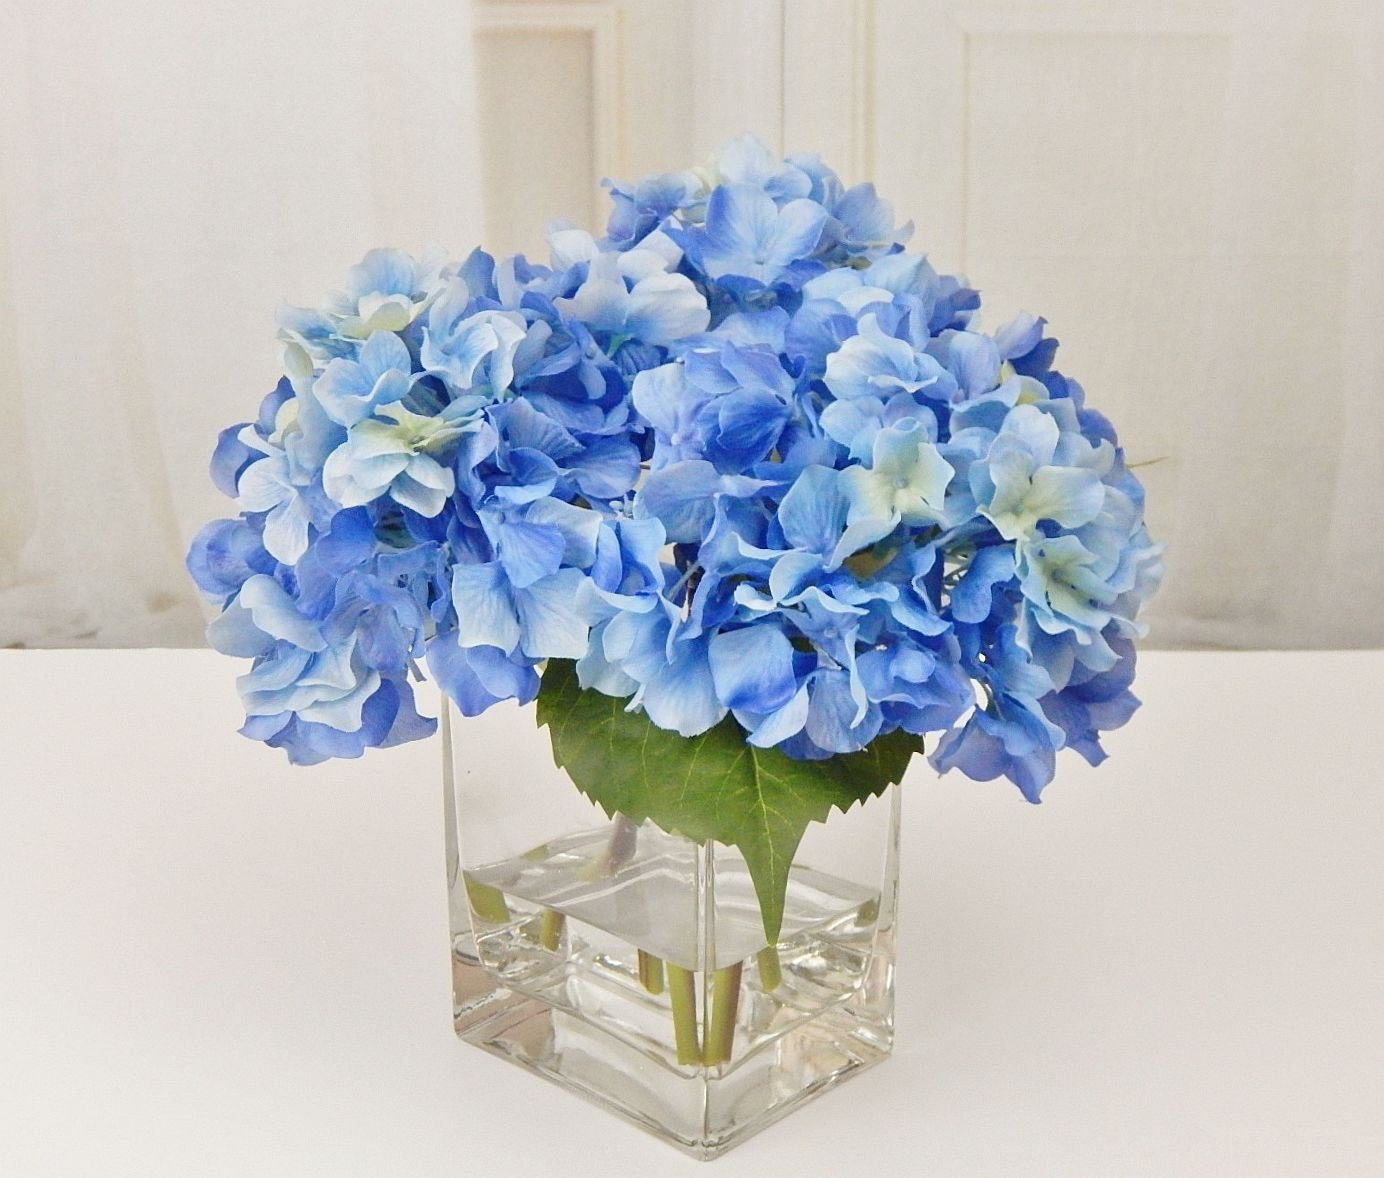 Blue silk hydrangea fauxacrylicillusion water real touch blue silk hydrangea fauxacrylicillusion water real touch flowers floral arrangement centerpiece wedding homeoffice decor gift mightylinksfo